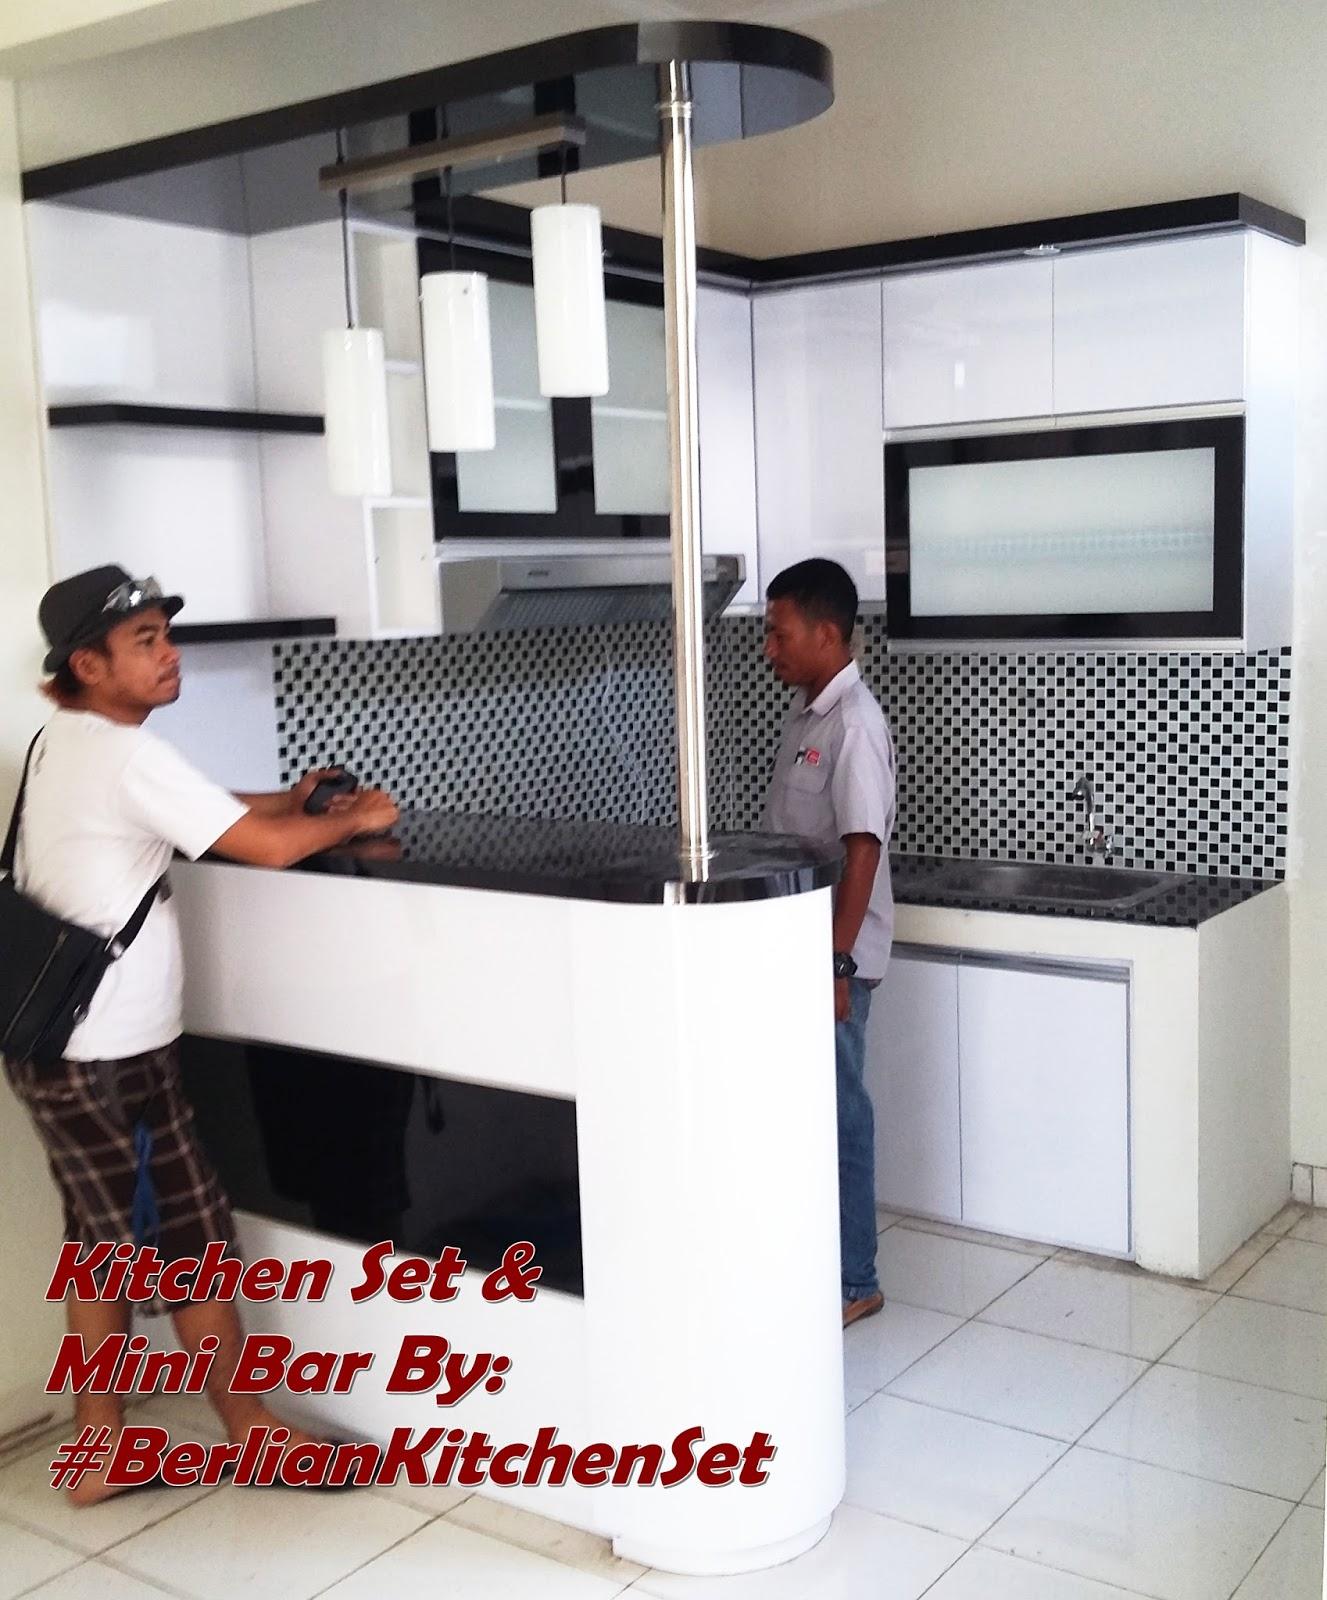 Berlian kitchen set minimalis murah ragam desain kitchen set for Kitchen set dibawah 5 juta